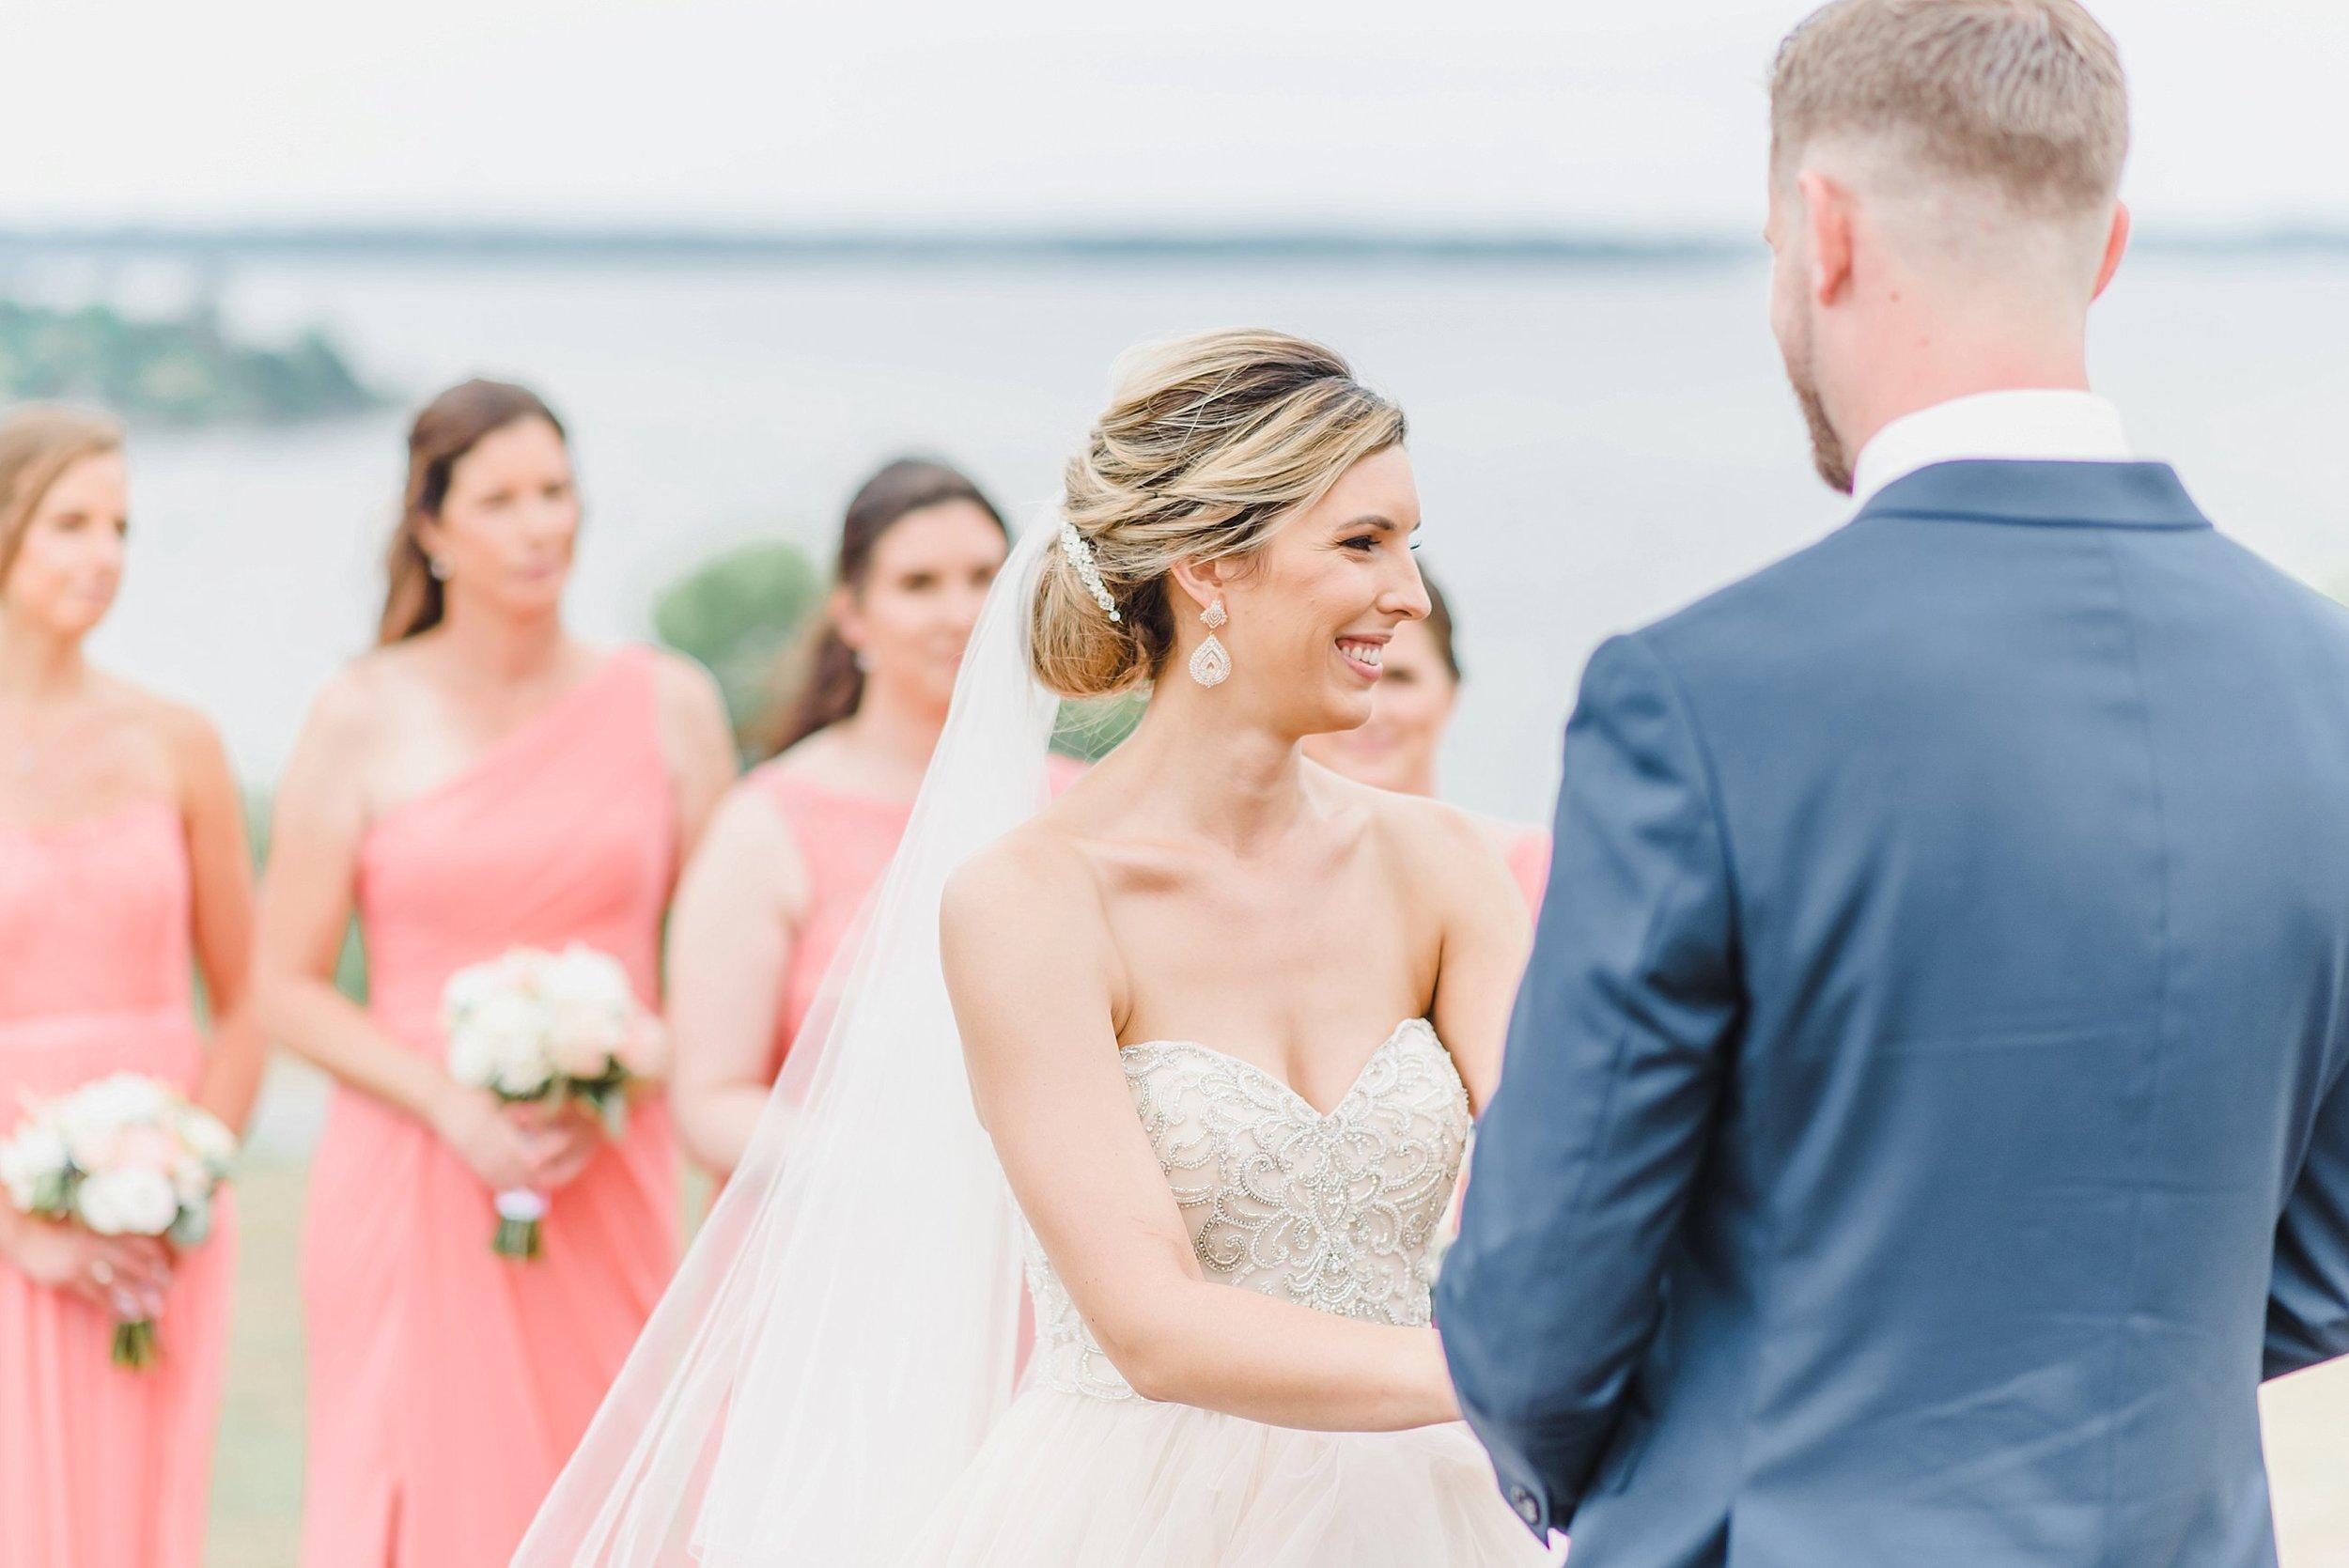 light airy indie fine art ottawa wedding photographer | Ali and Batoul Photography_0189.jpg